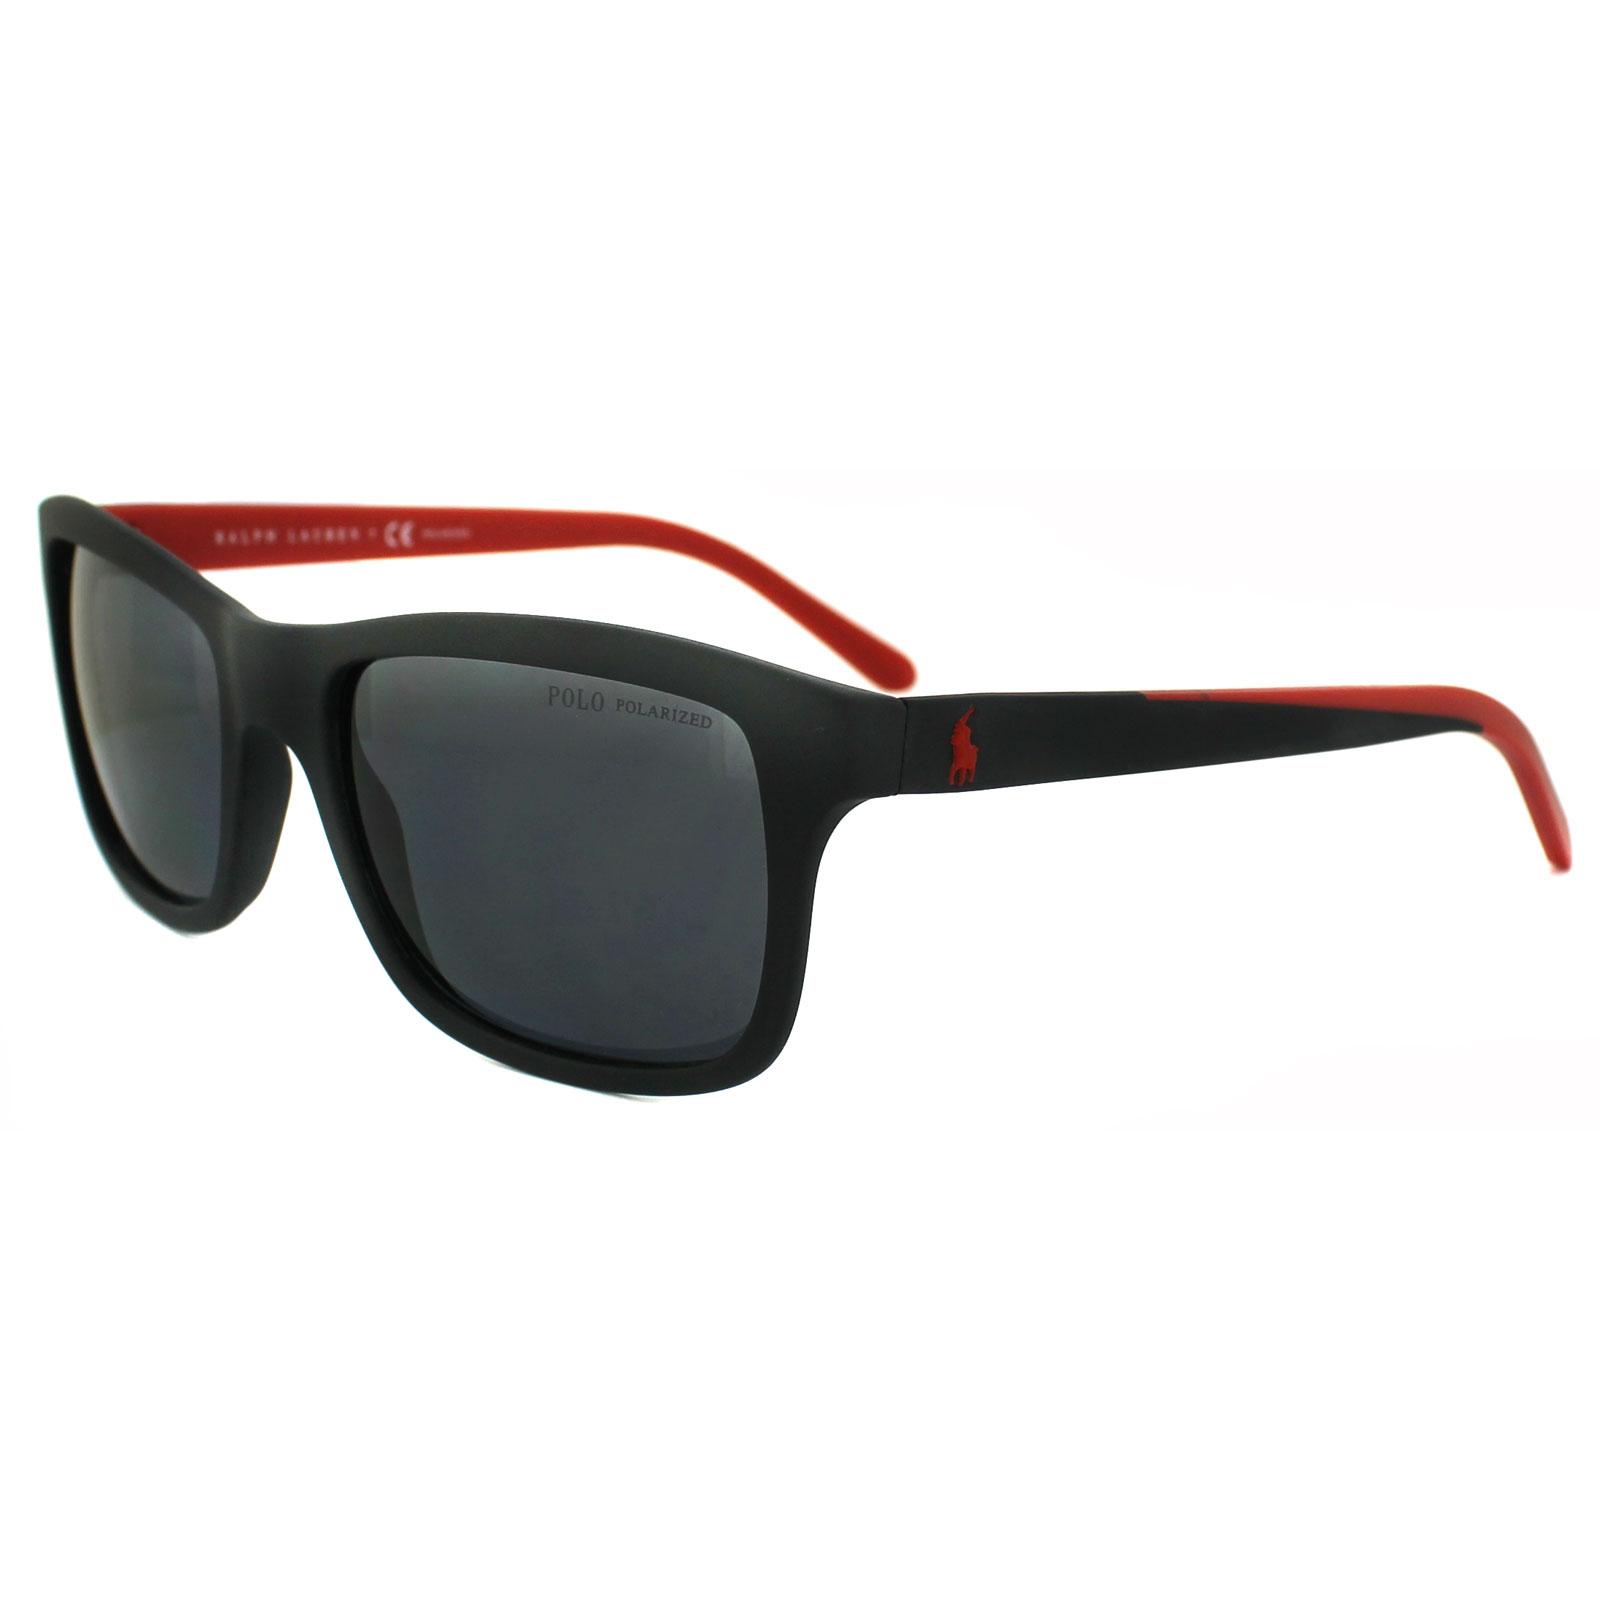 Beverly Hills Polo Club Sunglasses  polo sunglasses ebay